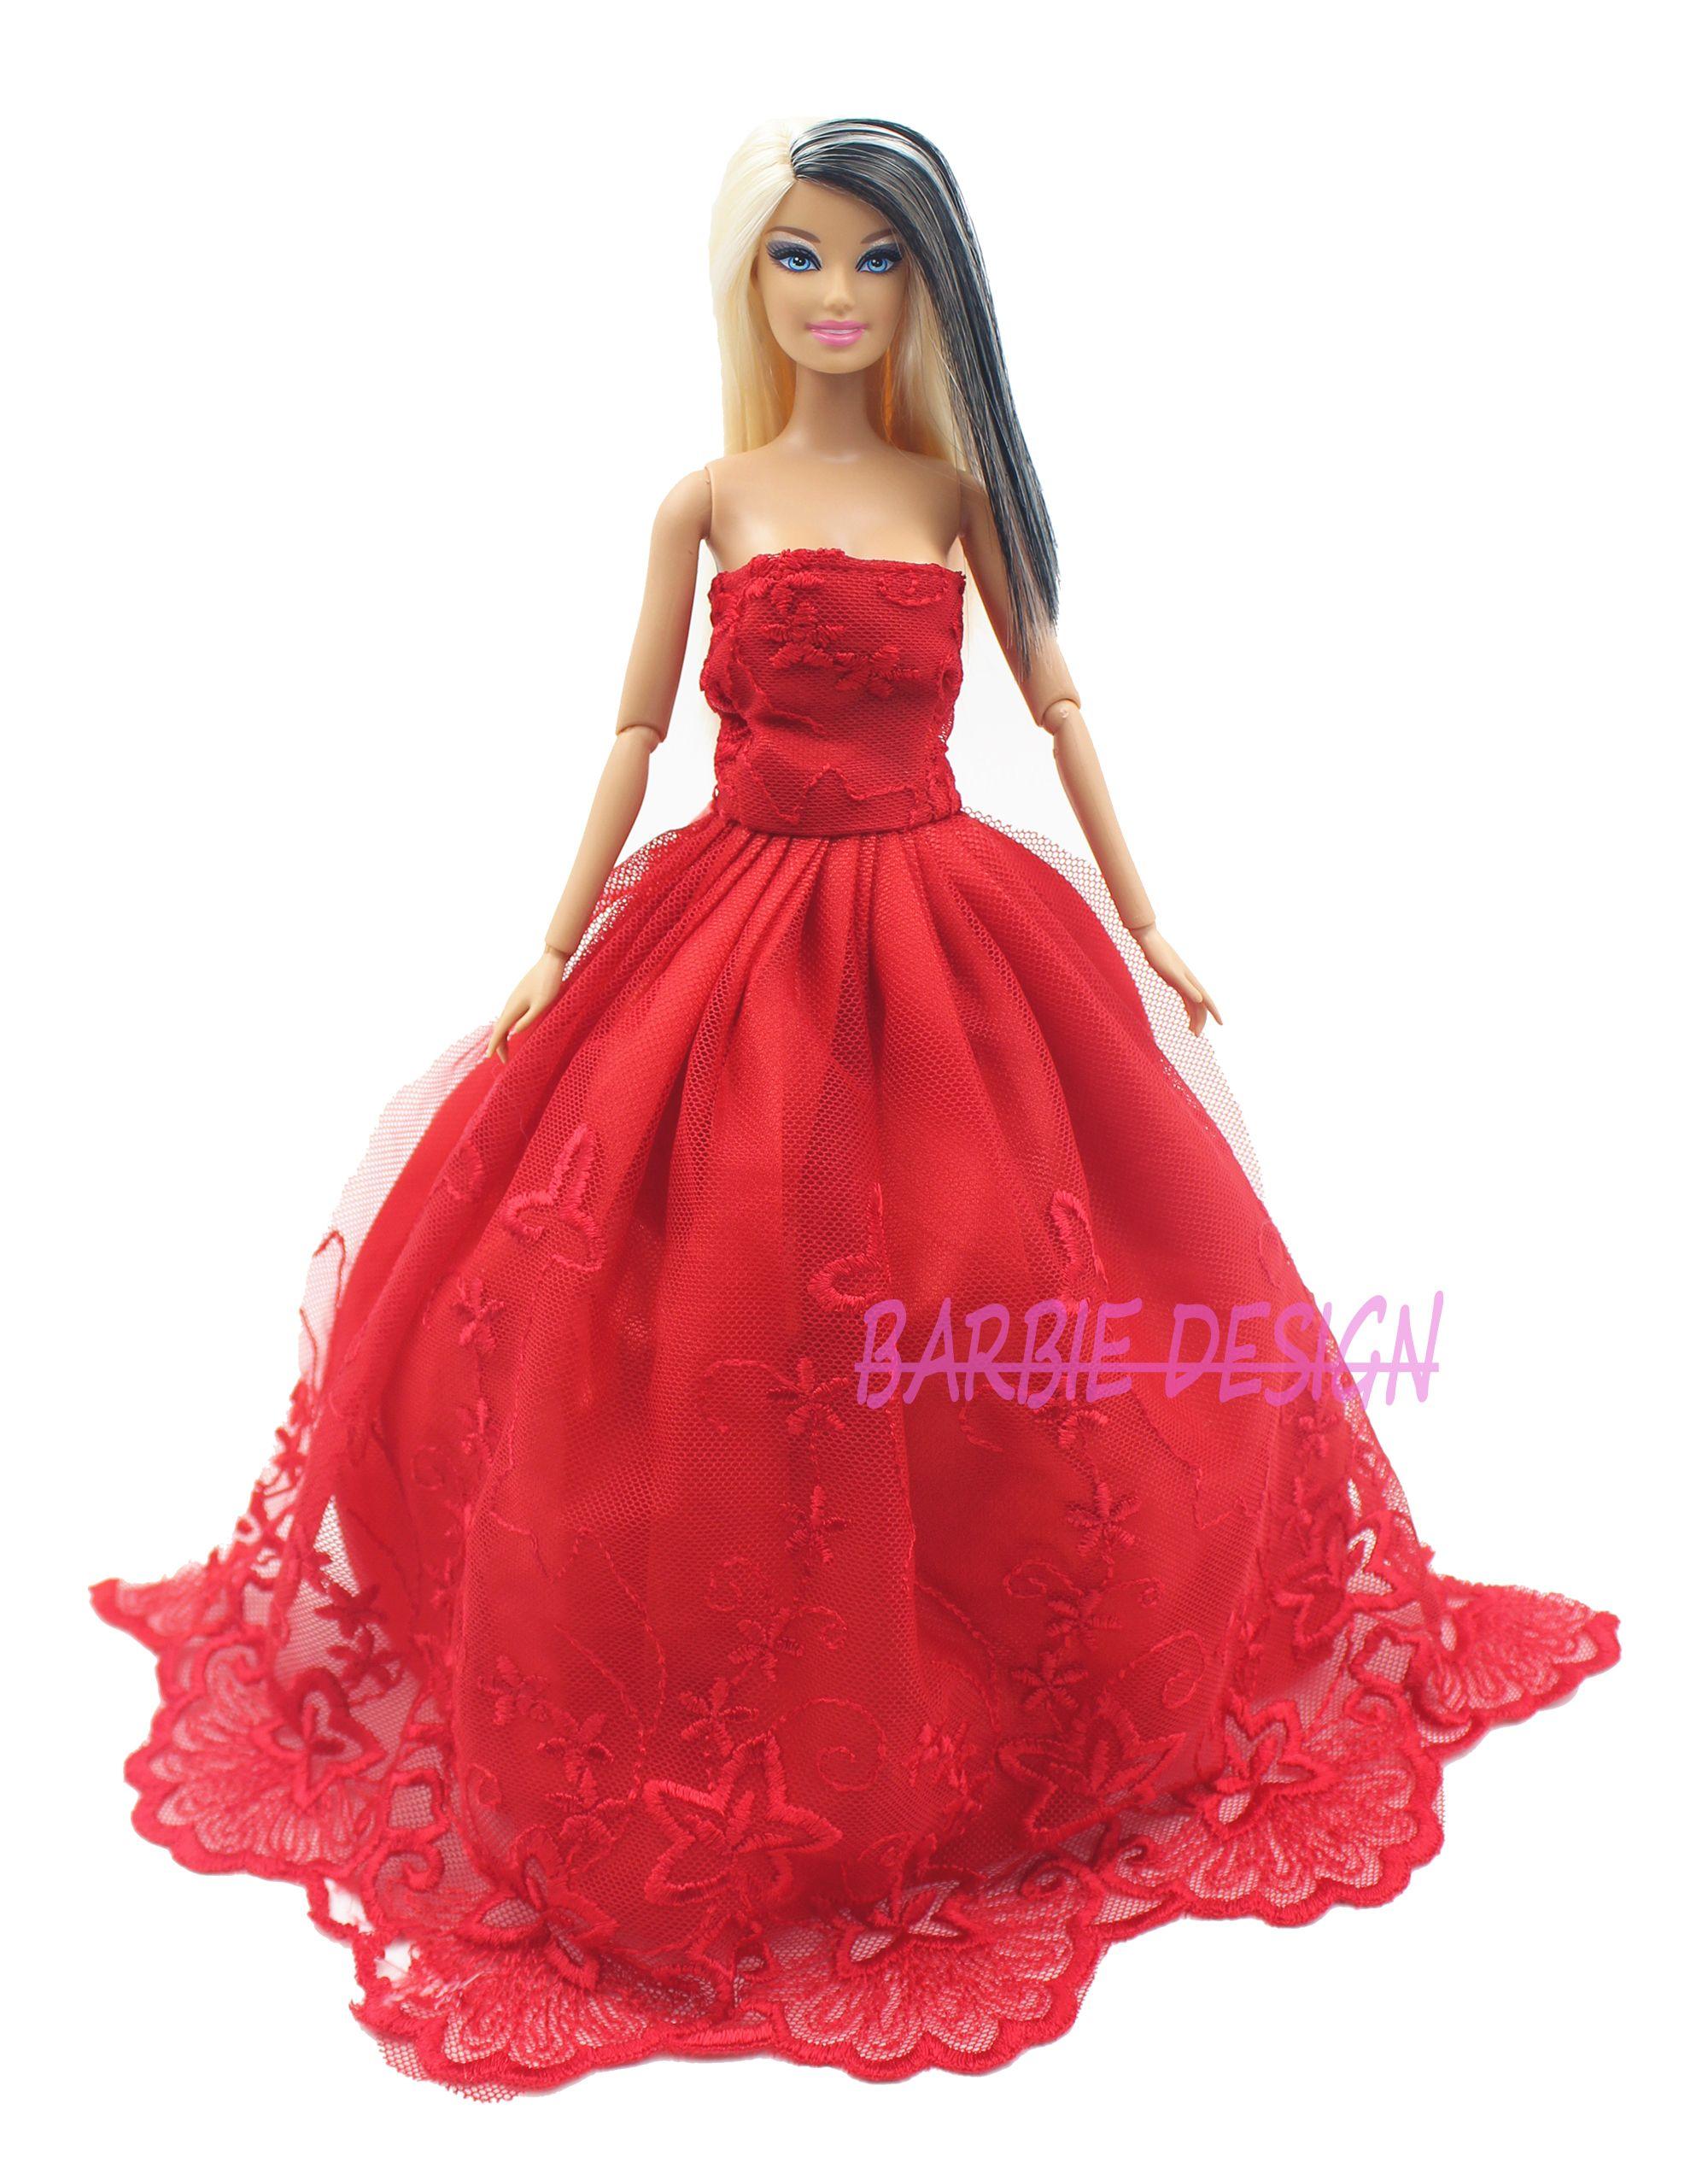 Handmade elegant princessdoll multideck dress bridal wedding